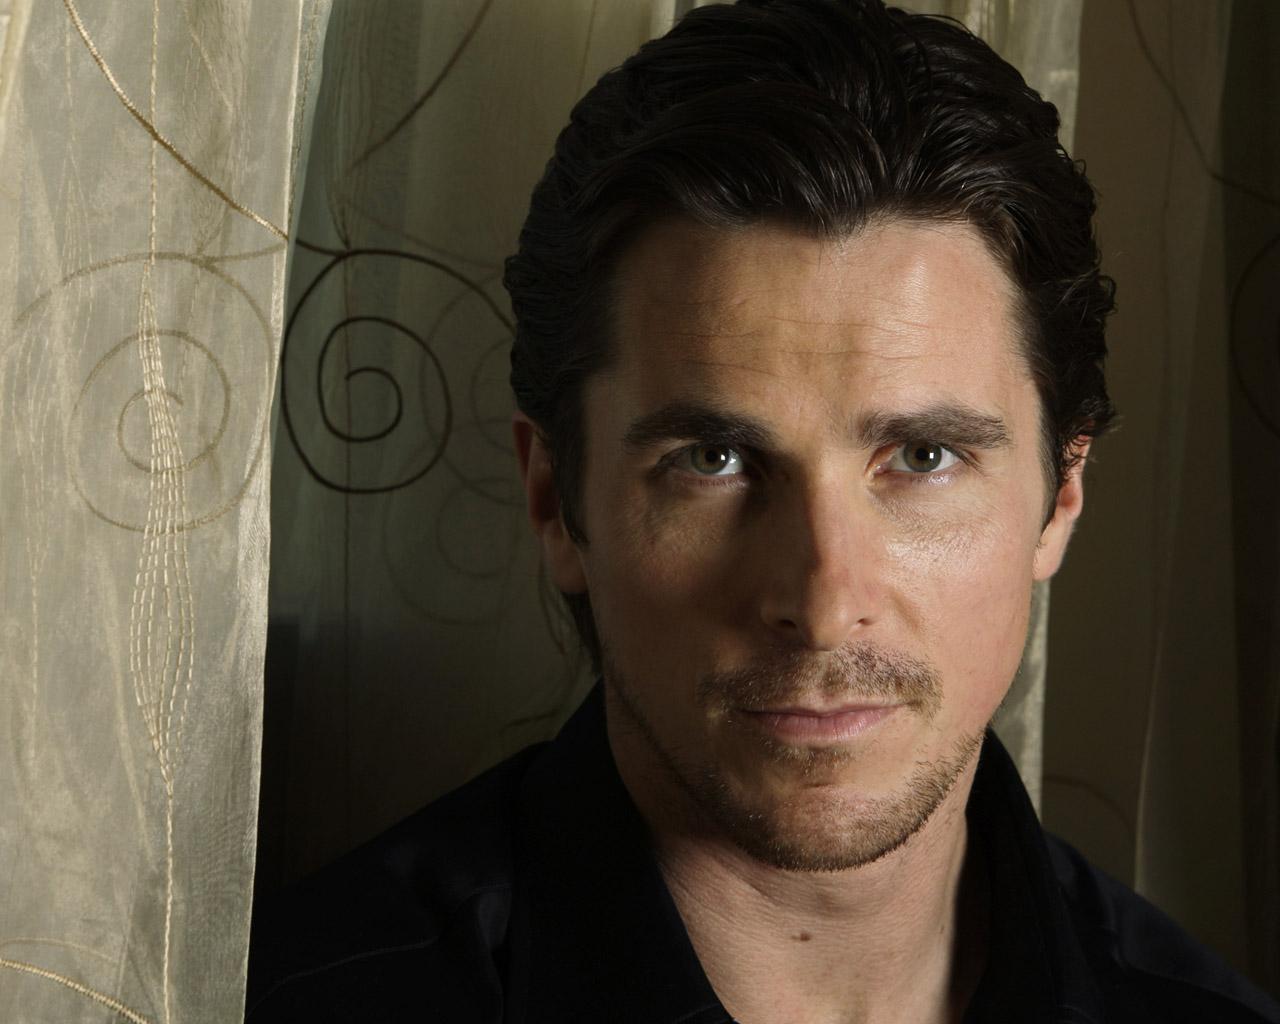 Christian Bale: Wallpaperstopick: Christian Bale